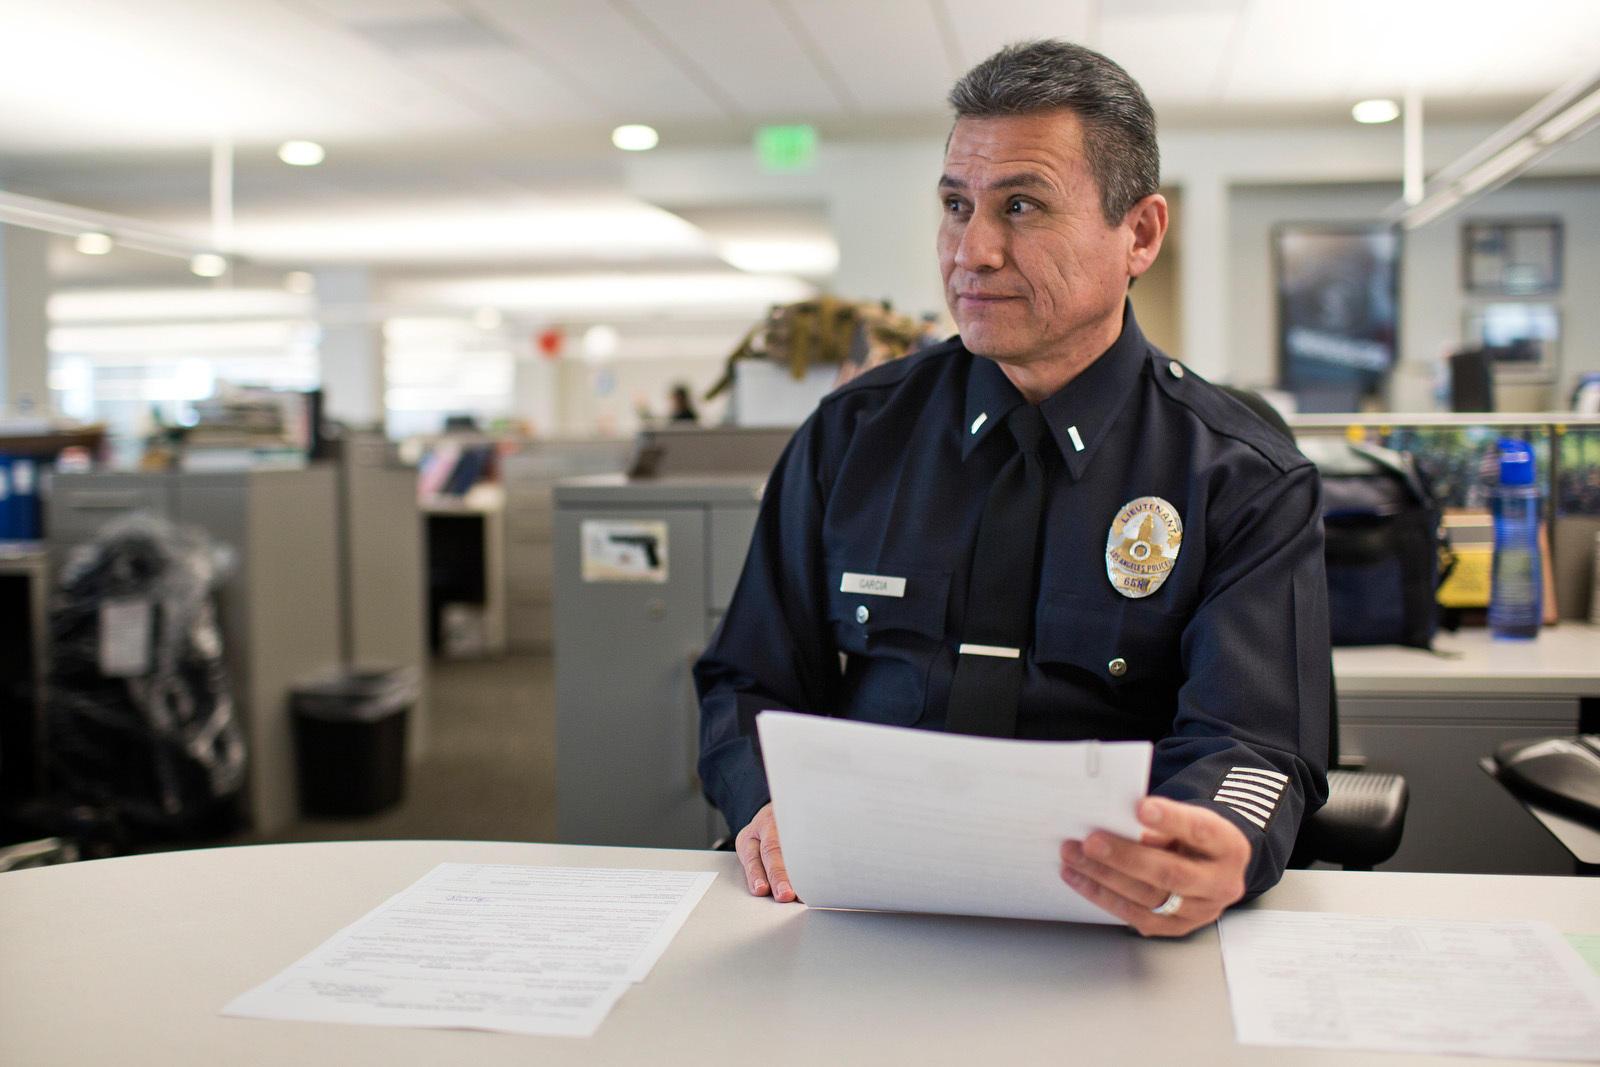 LA Police Unit Intervenes To Get Mentally Ill Treatment ...